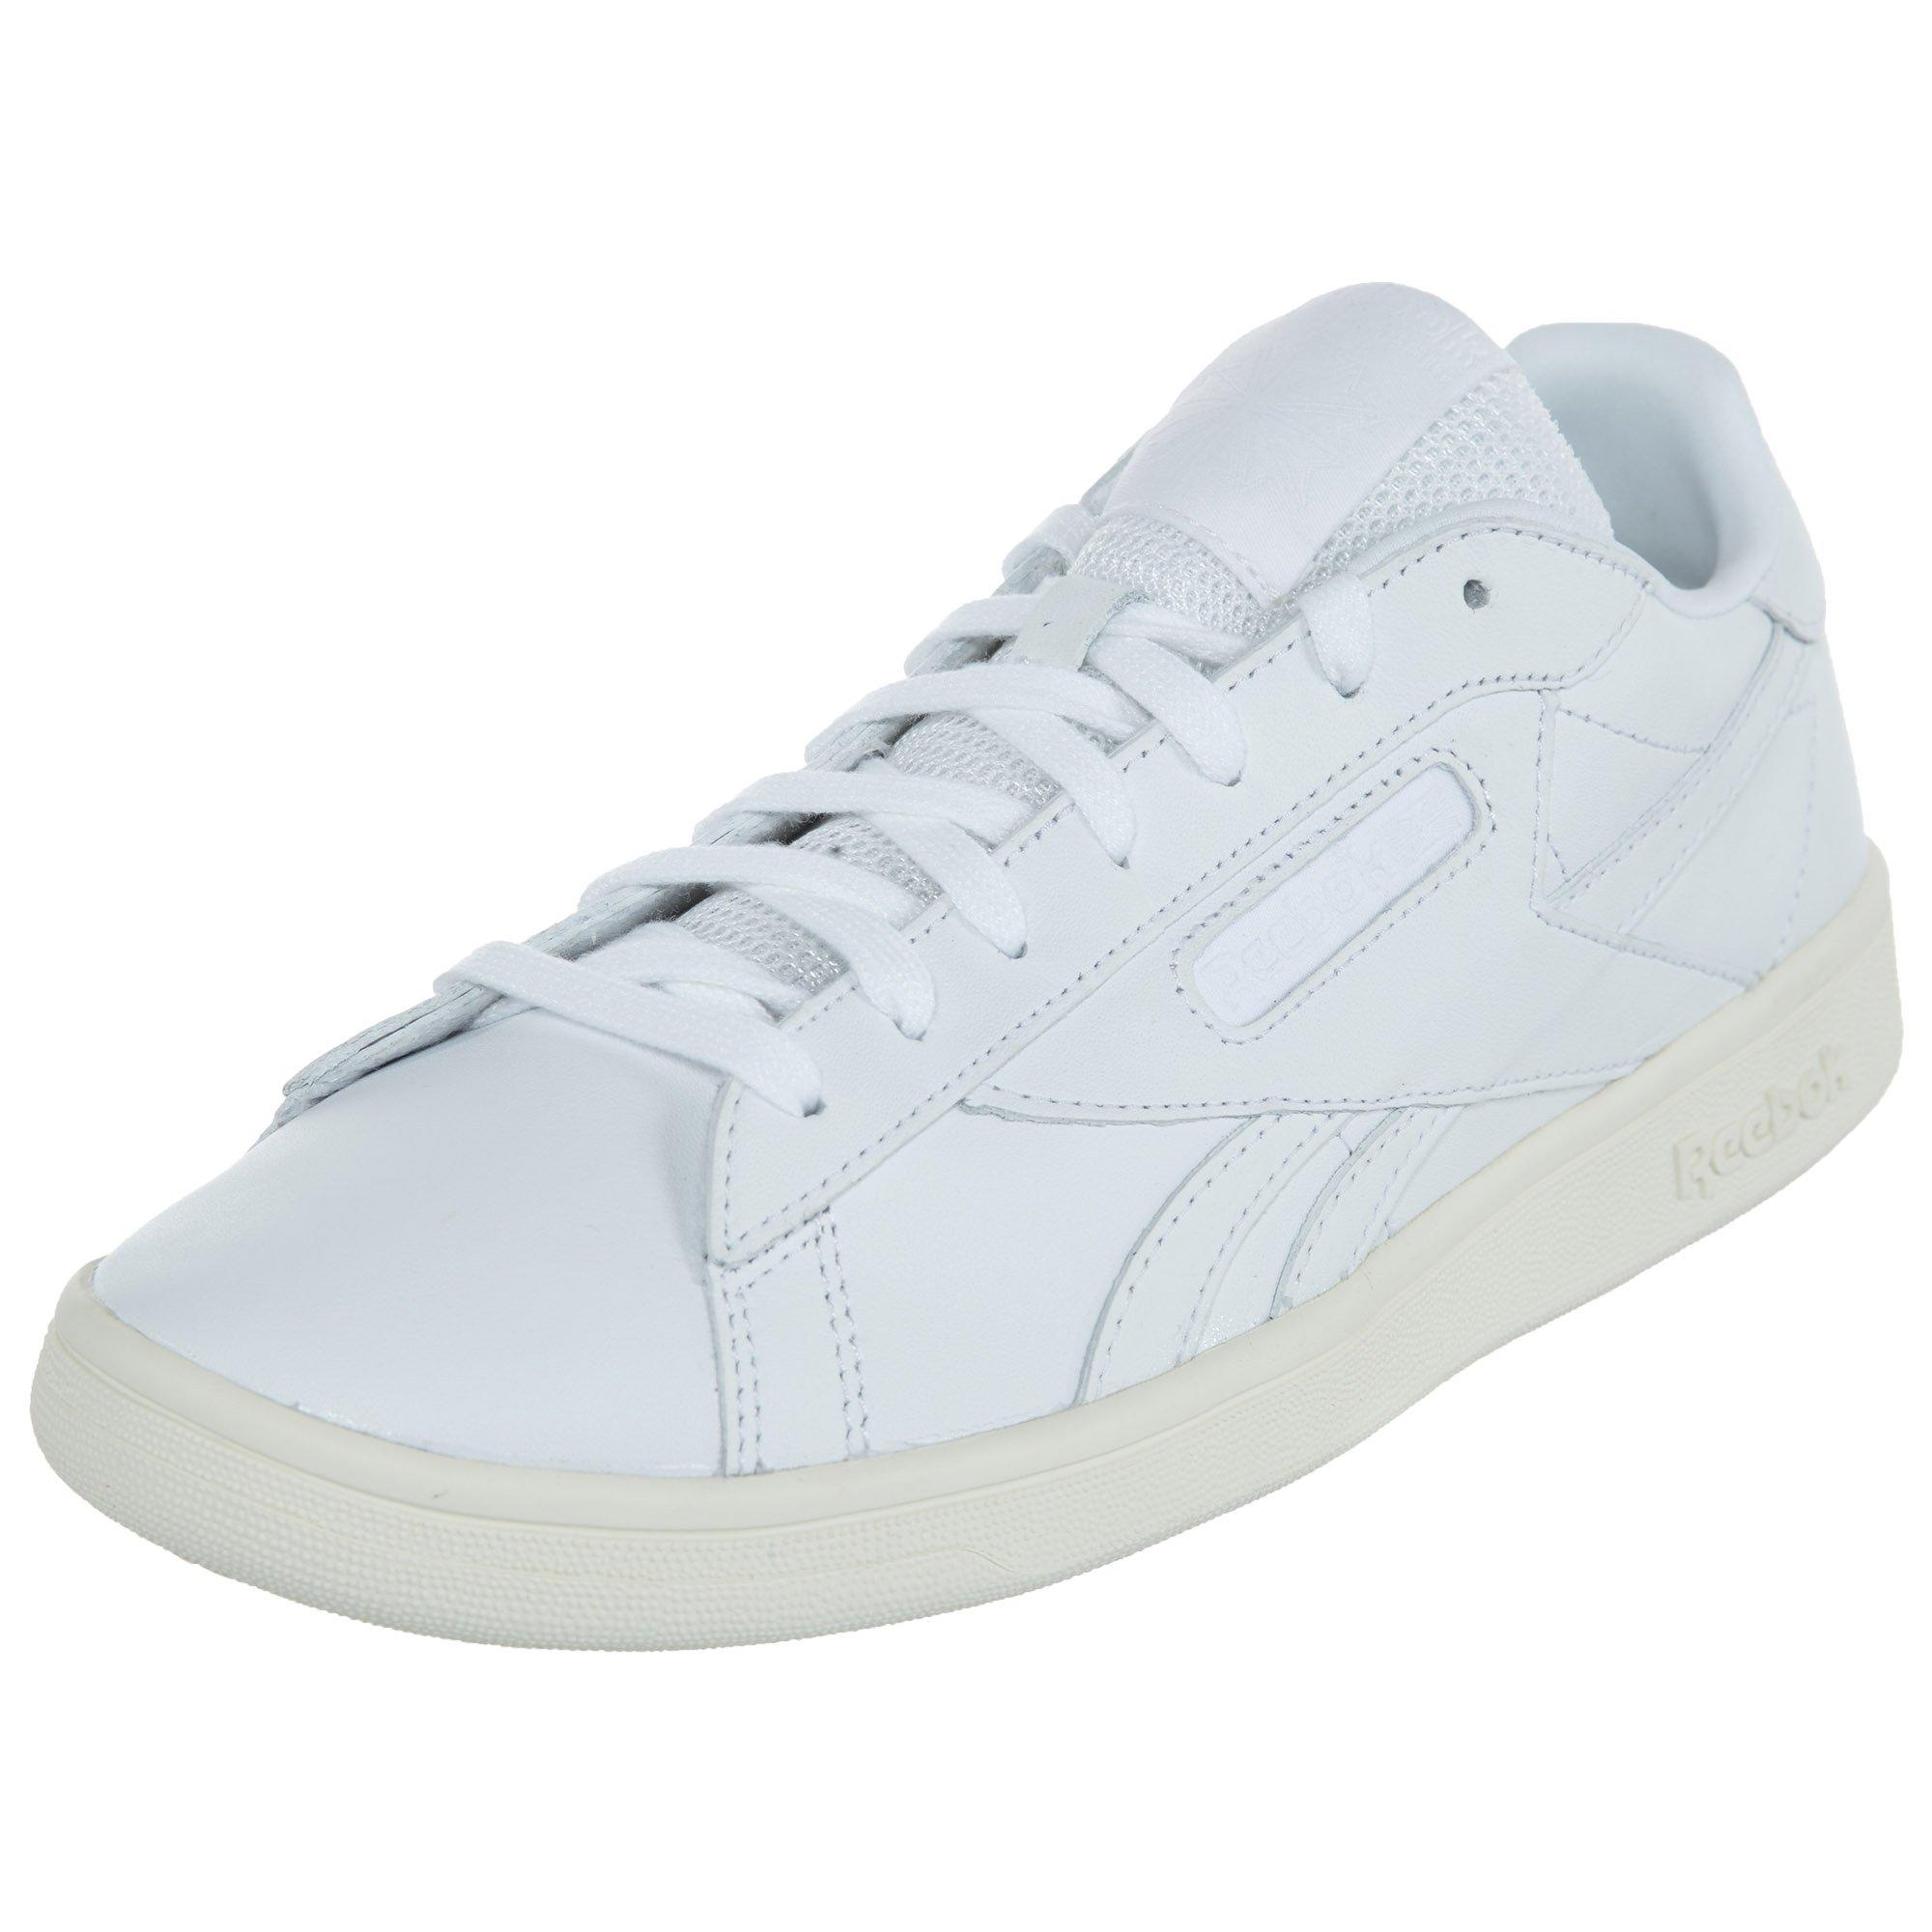 Reebok Women's NPC UK Lthr Track Shoe, White/Chalk, 7.5 M US